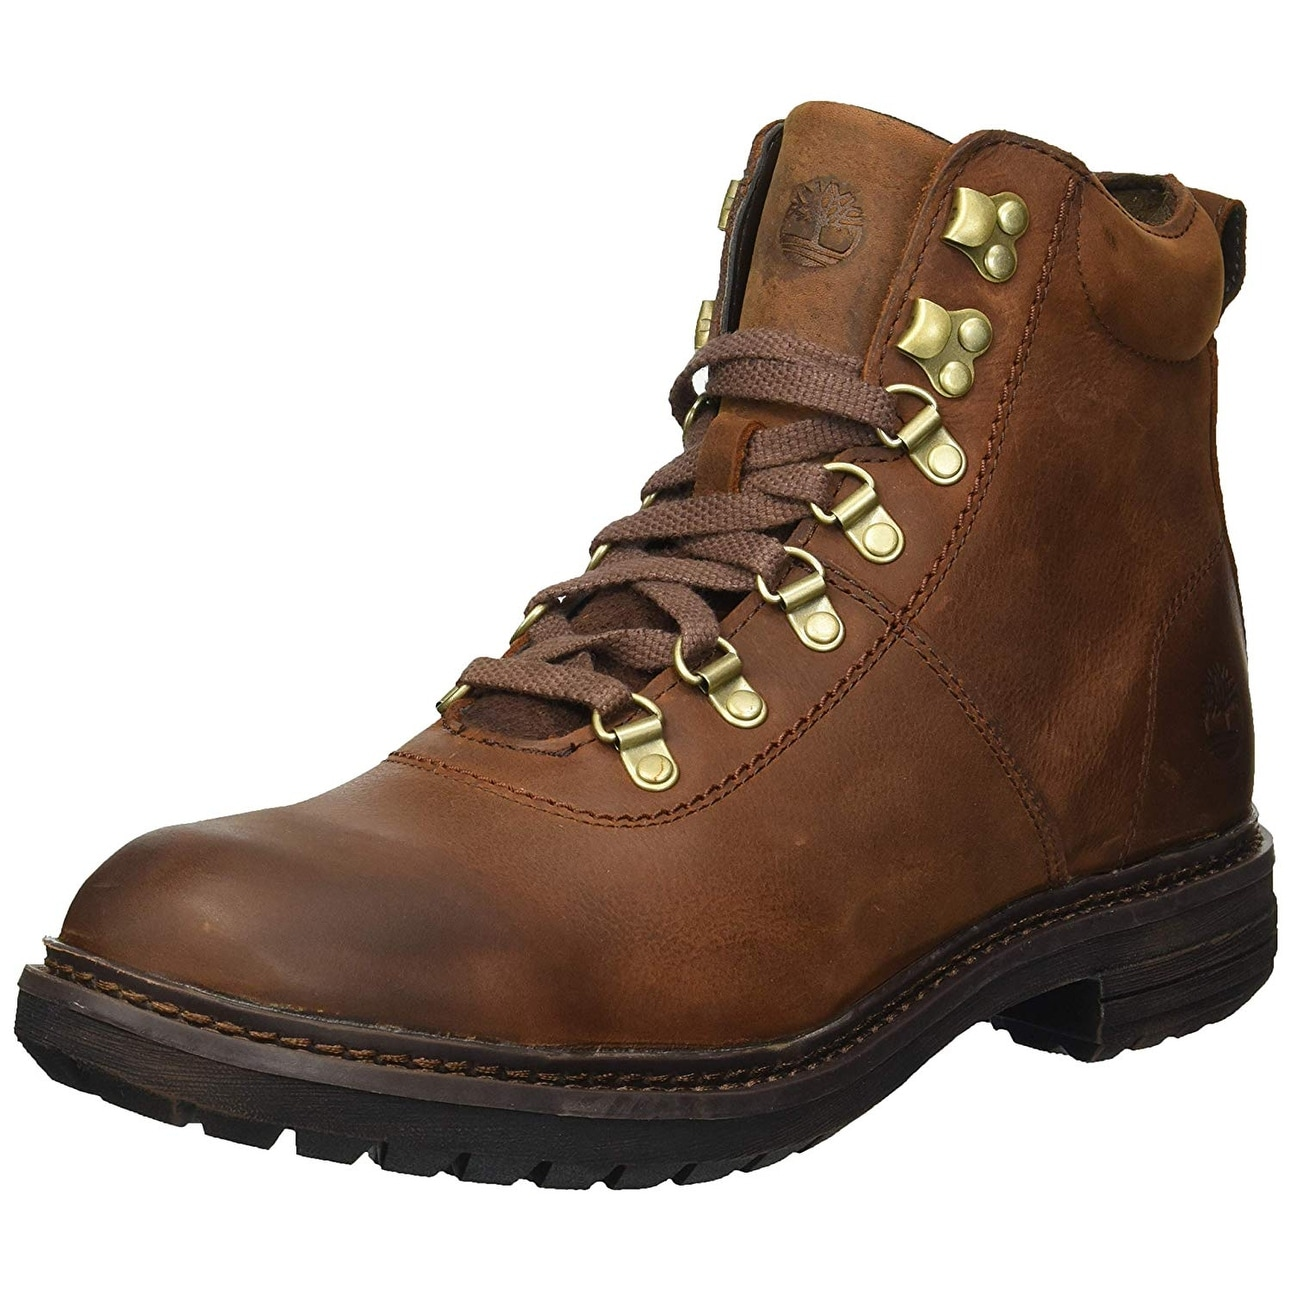 578c0a38e87 Timberland Men's Logan Bay Alpine Hiker Ankle Boot - 10